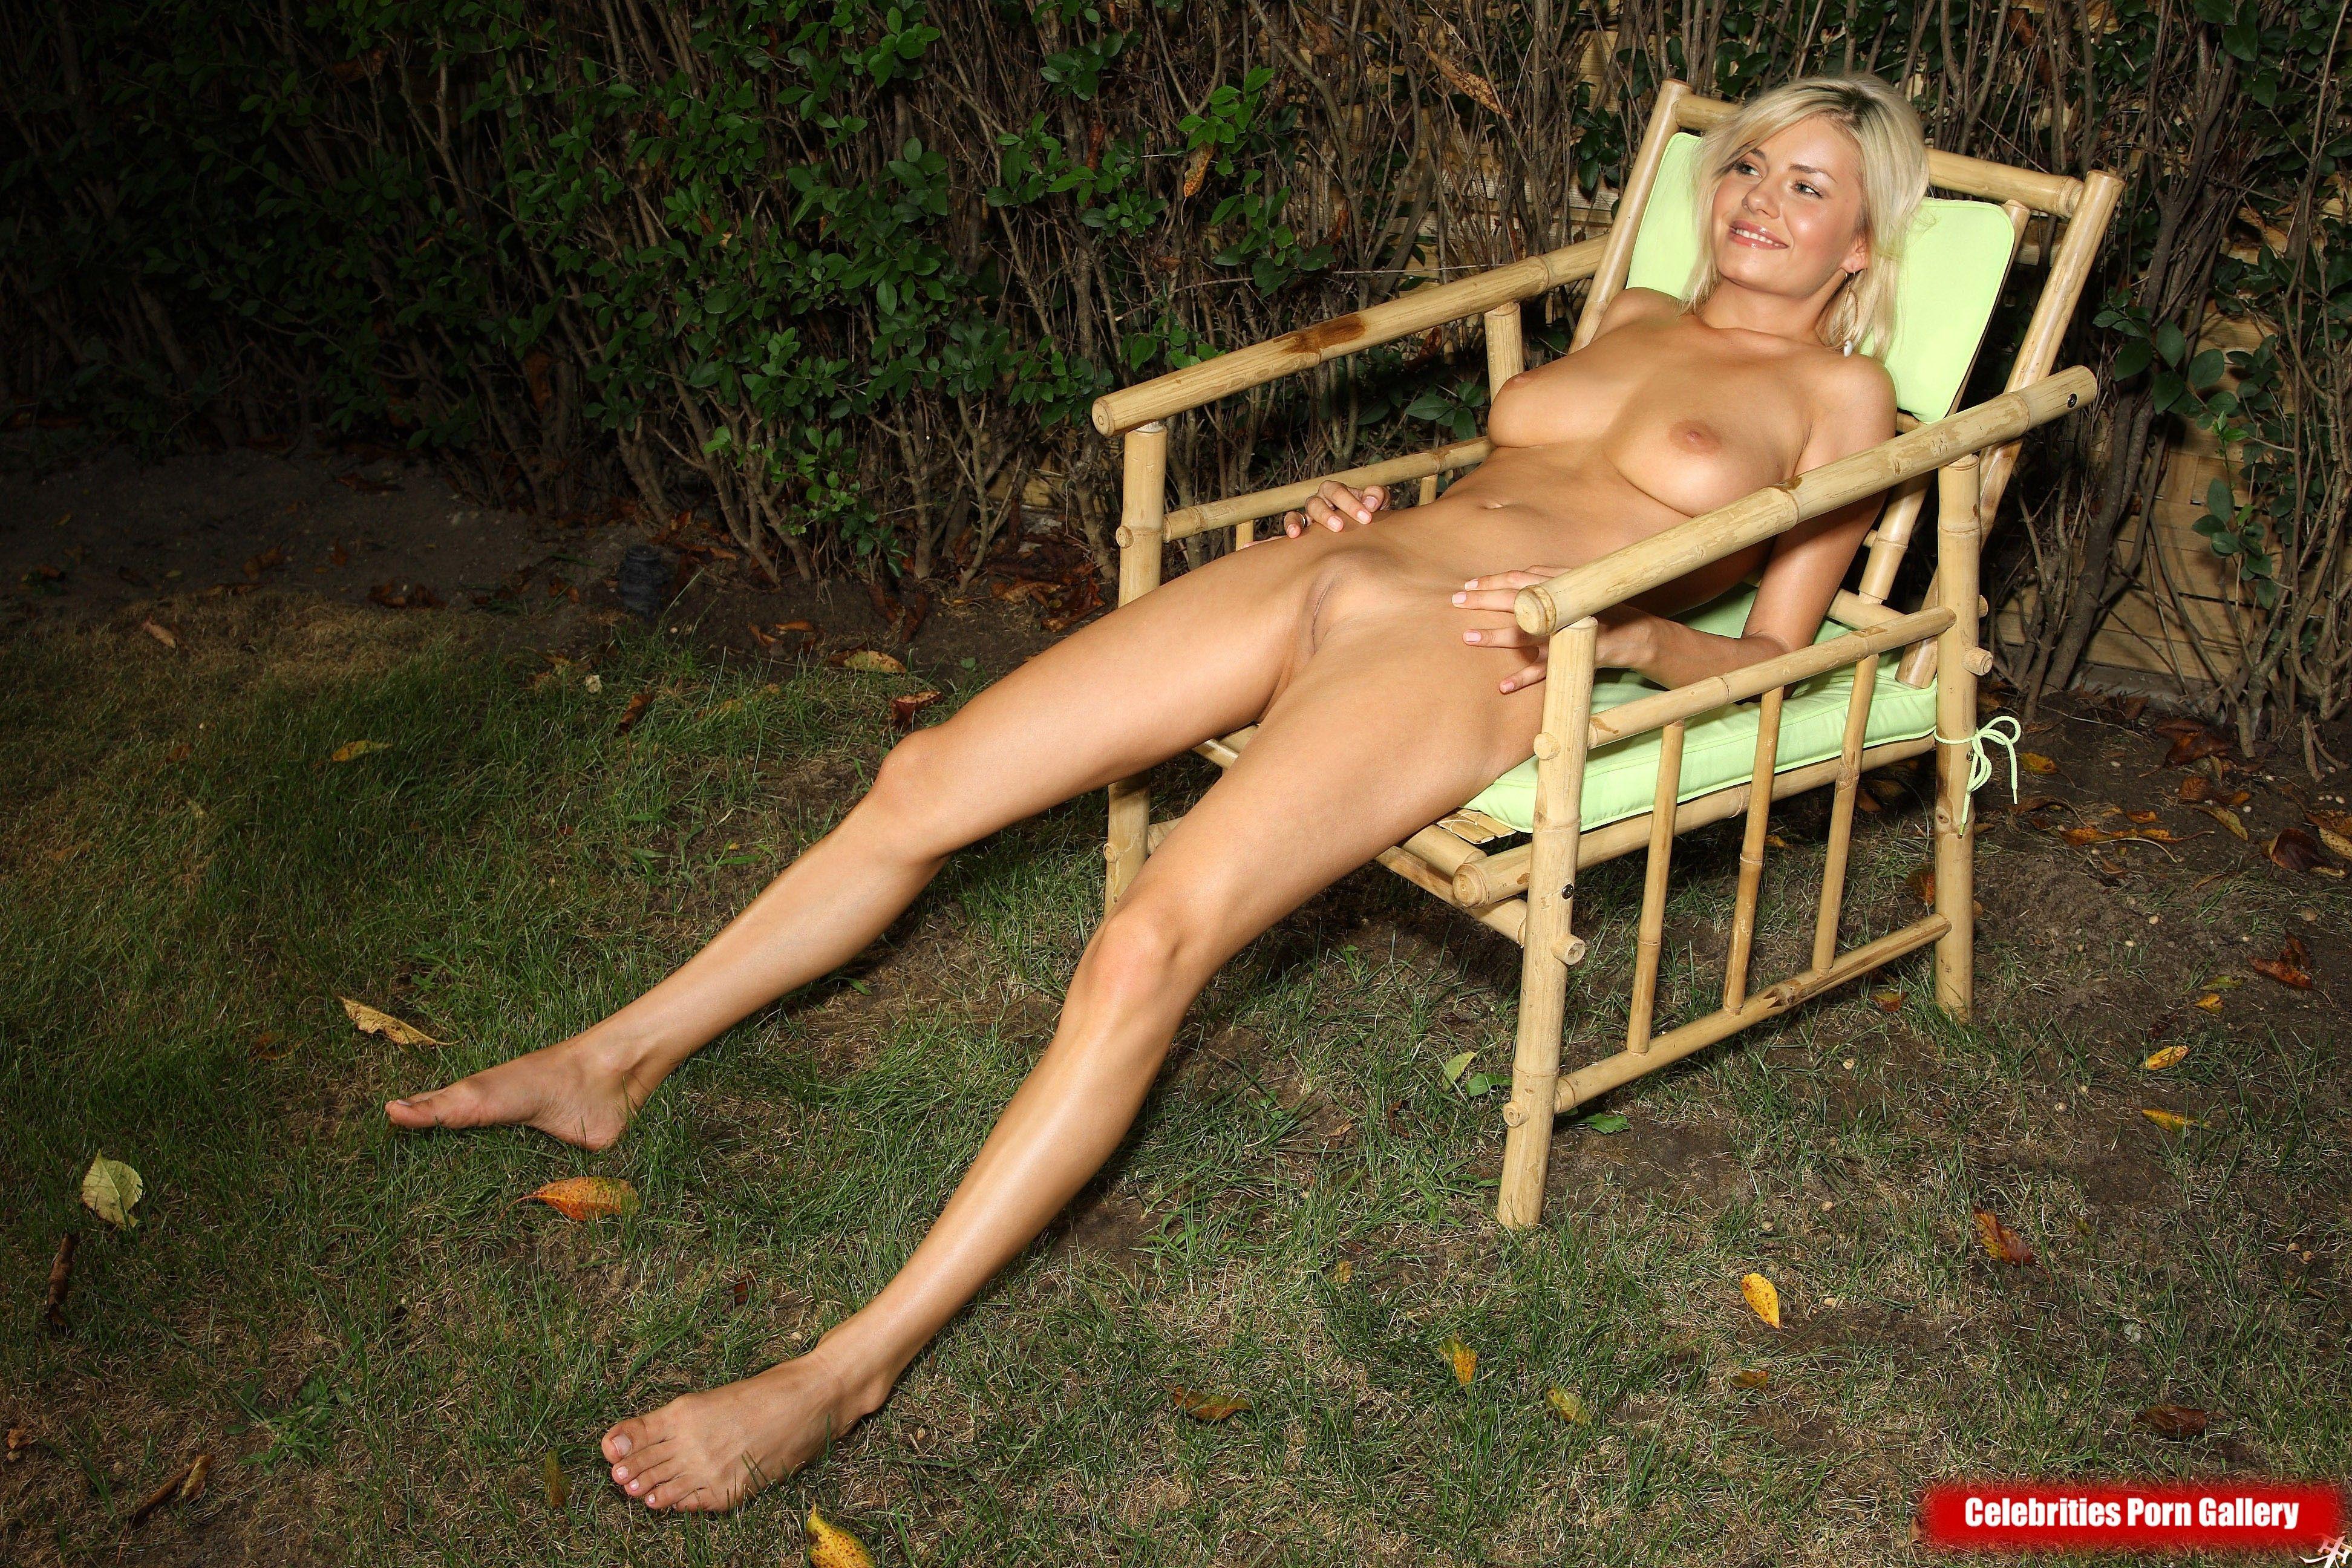 Elisha Cuthbert Nude Porn - Image result for elisha cuthbert nude fake